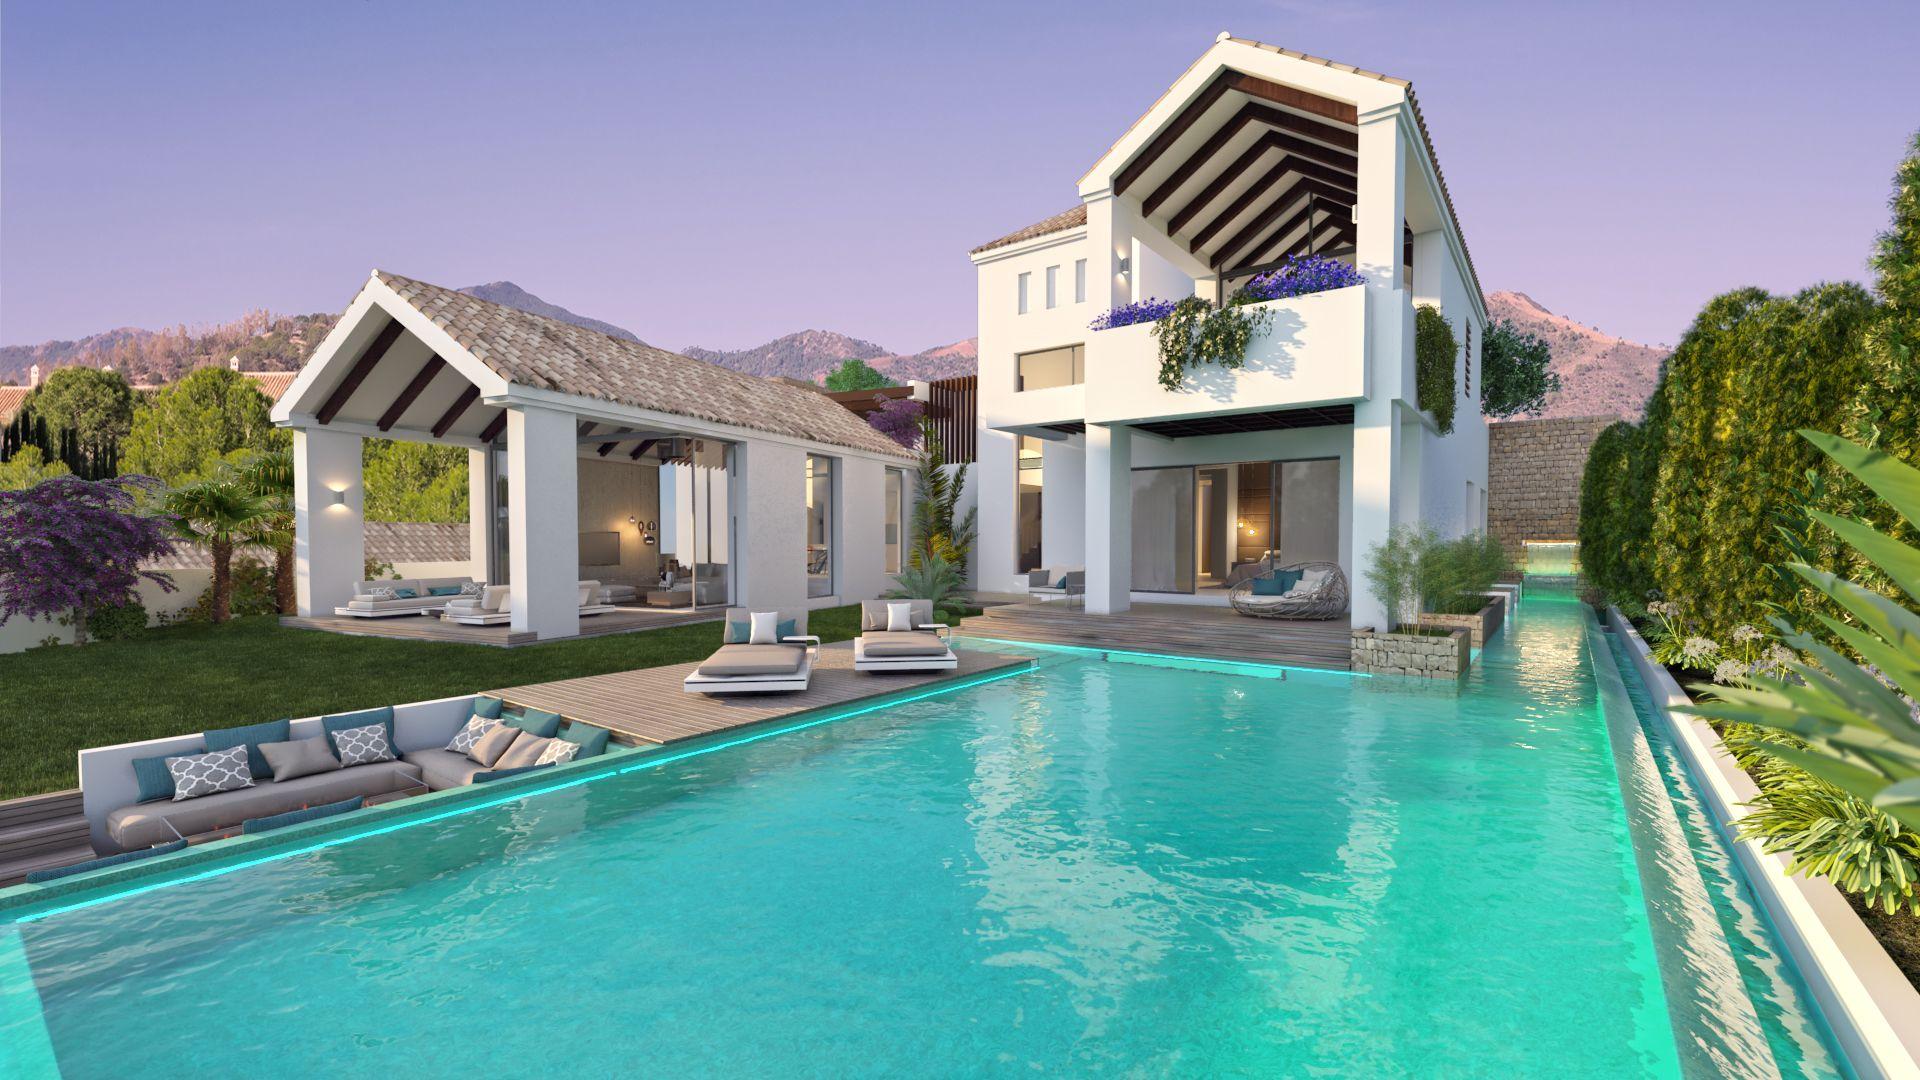 dd4e0ecef9 Direct pool access from bedroom luxury villa golf sea views Marbella Costa  del Sol The Heights at La Resina Estepona